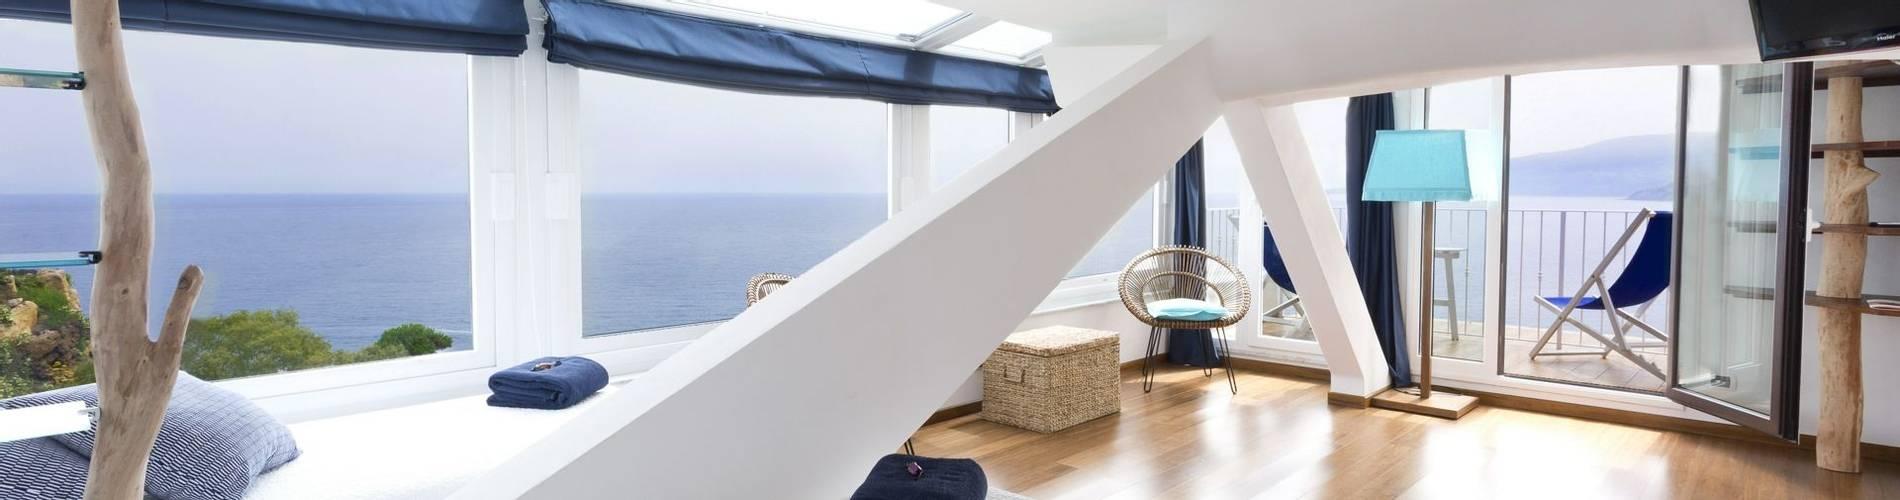 Kalura, Sicily, Italy, President suite.jpg